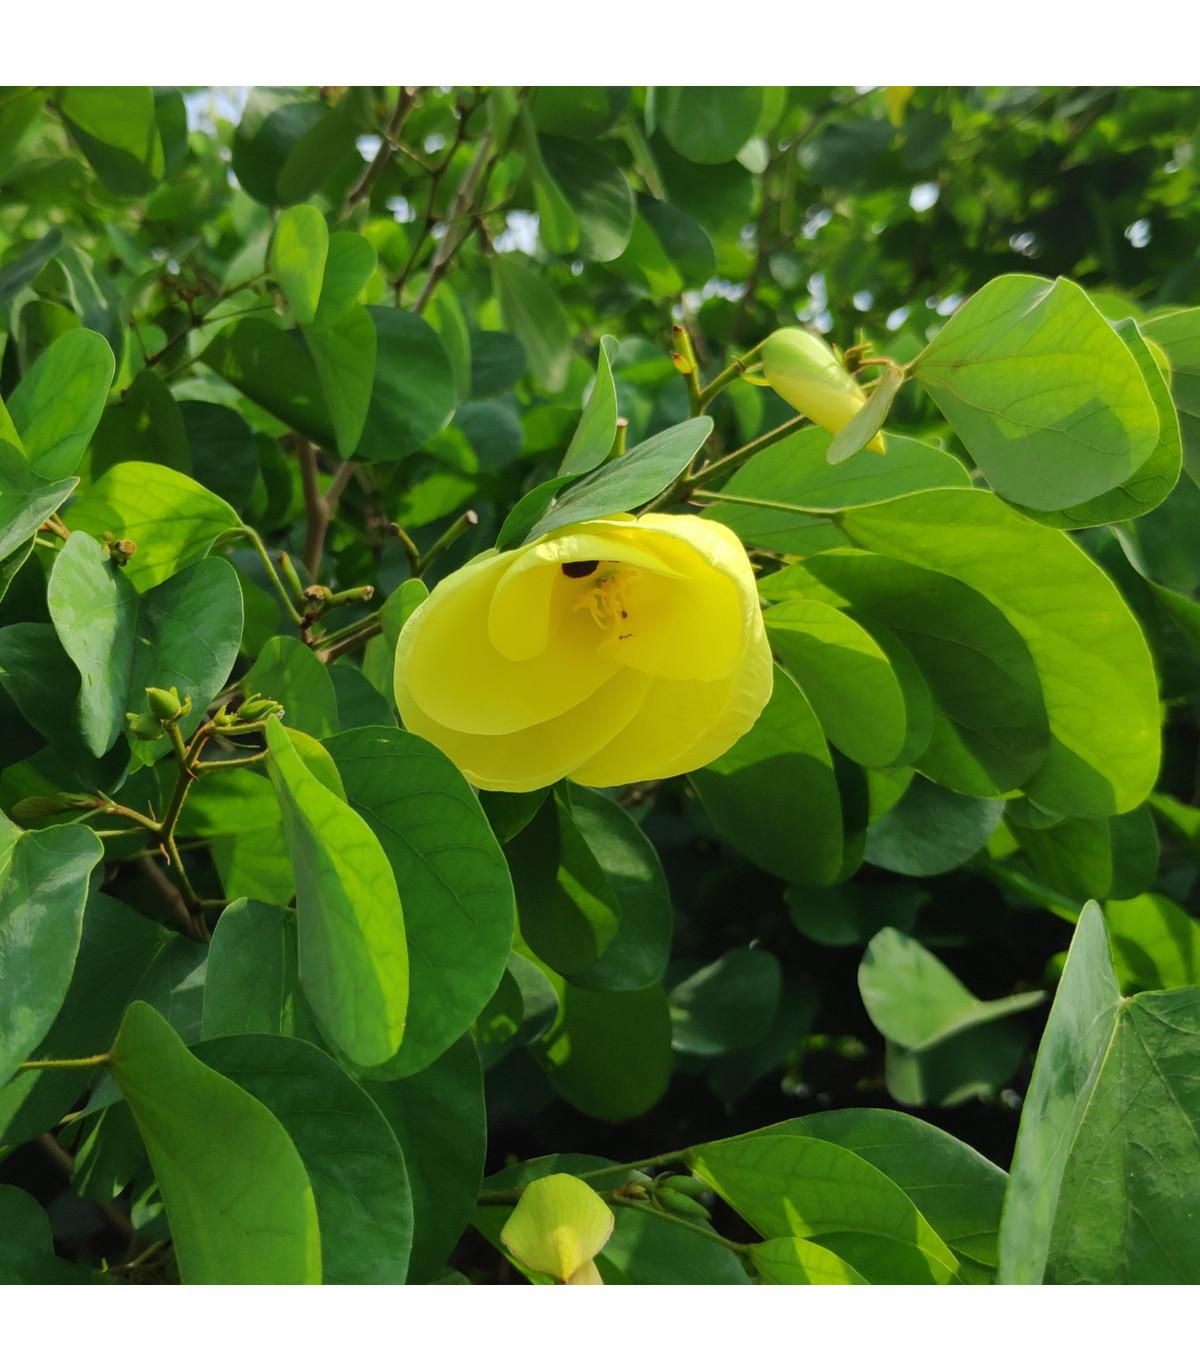 Bauhínia plstnatá - Bauhinia tomentosa - semená bauhínie - 4 ks